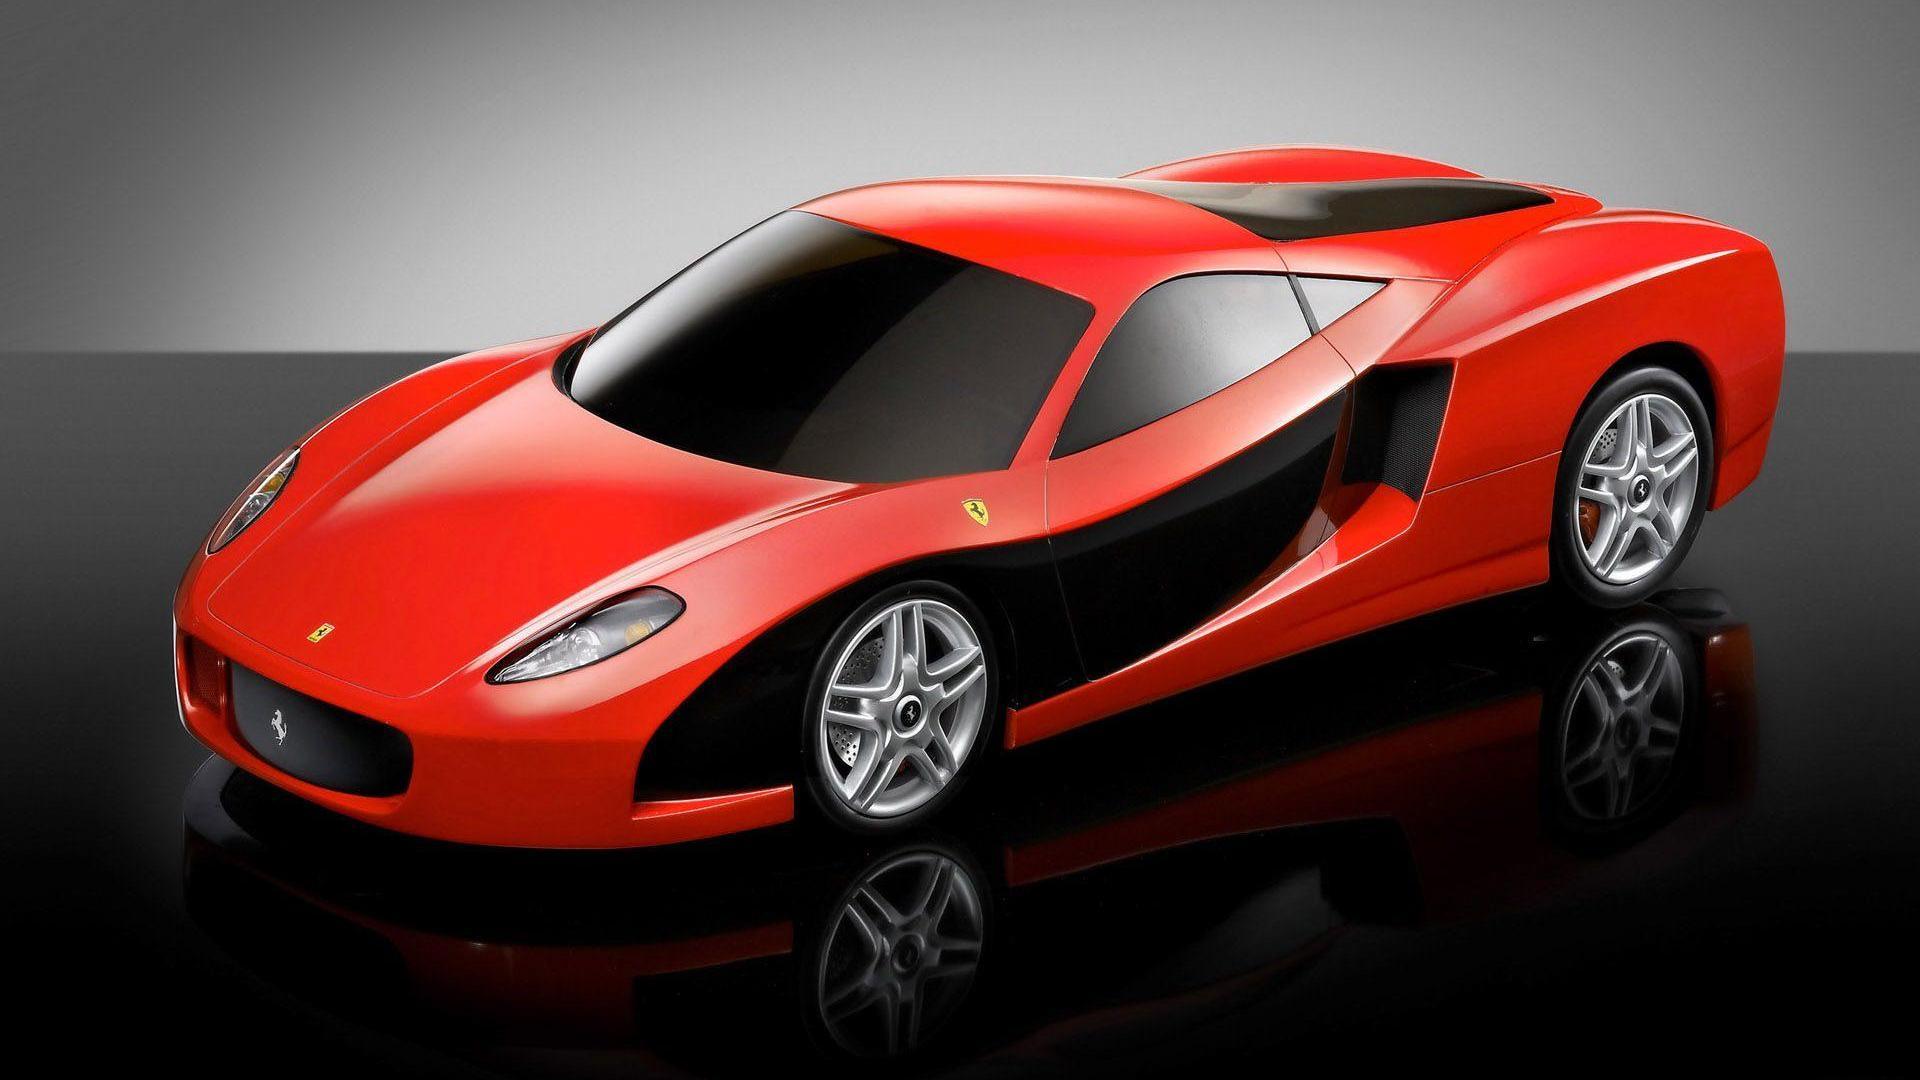 Ferrari Concept Wallpaper World Cars High Resolution Free